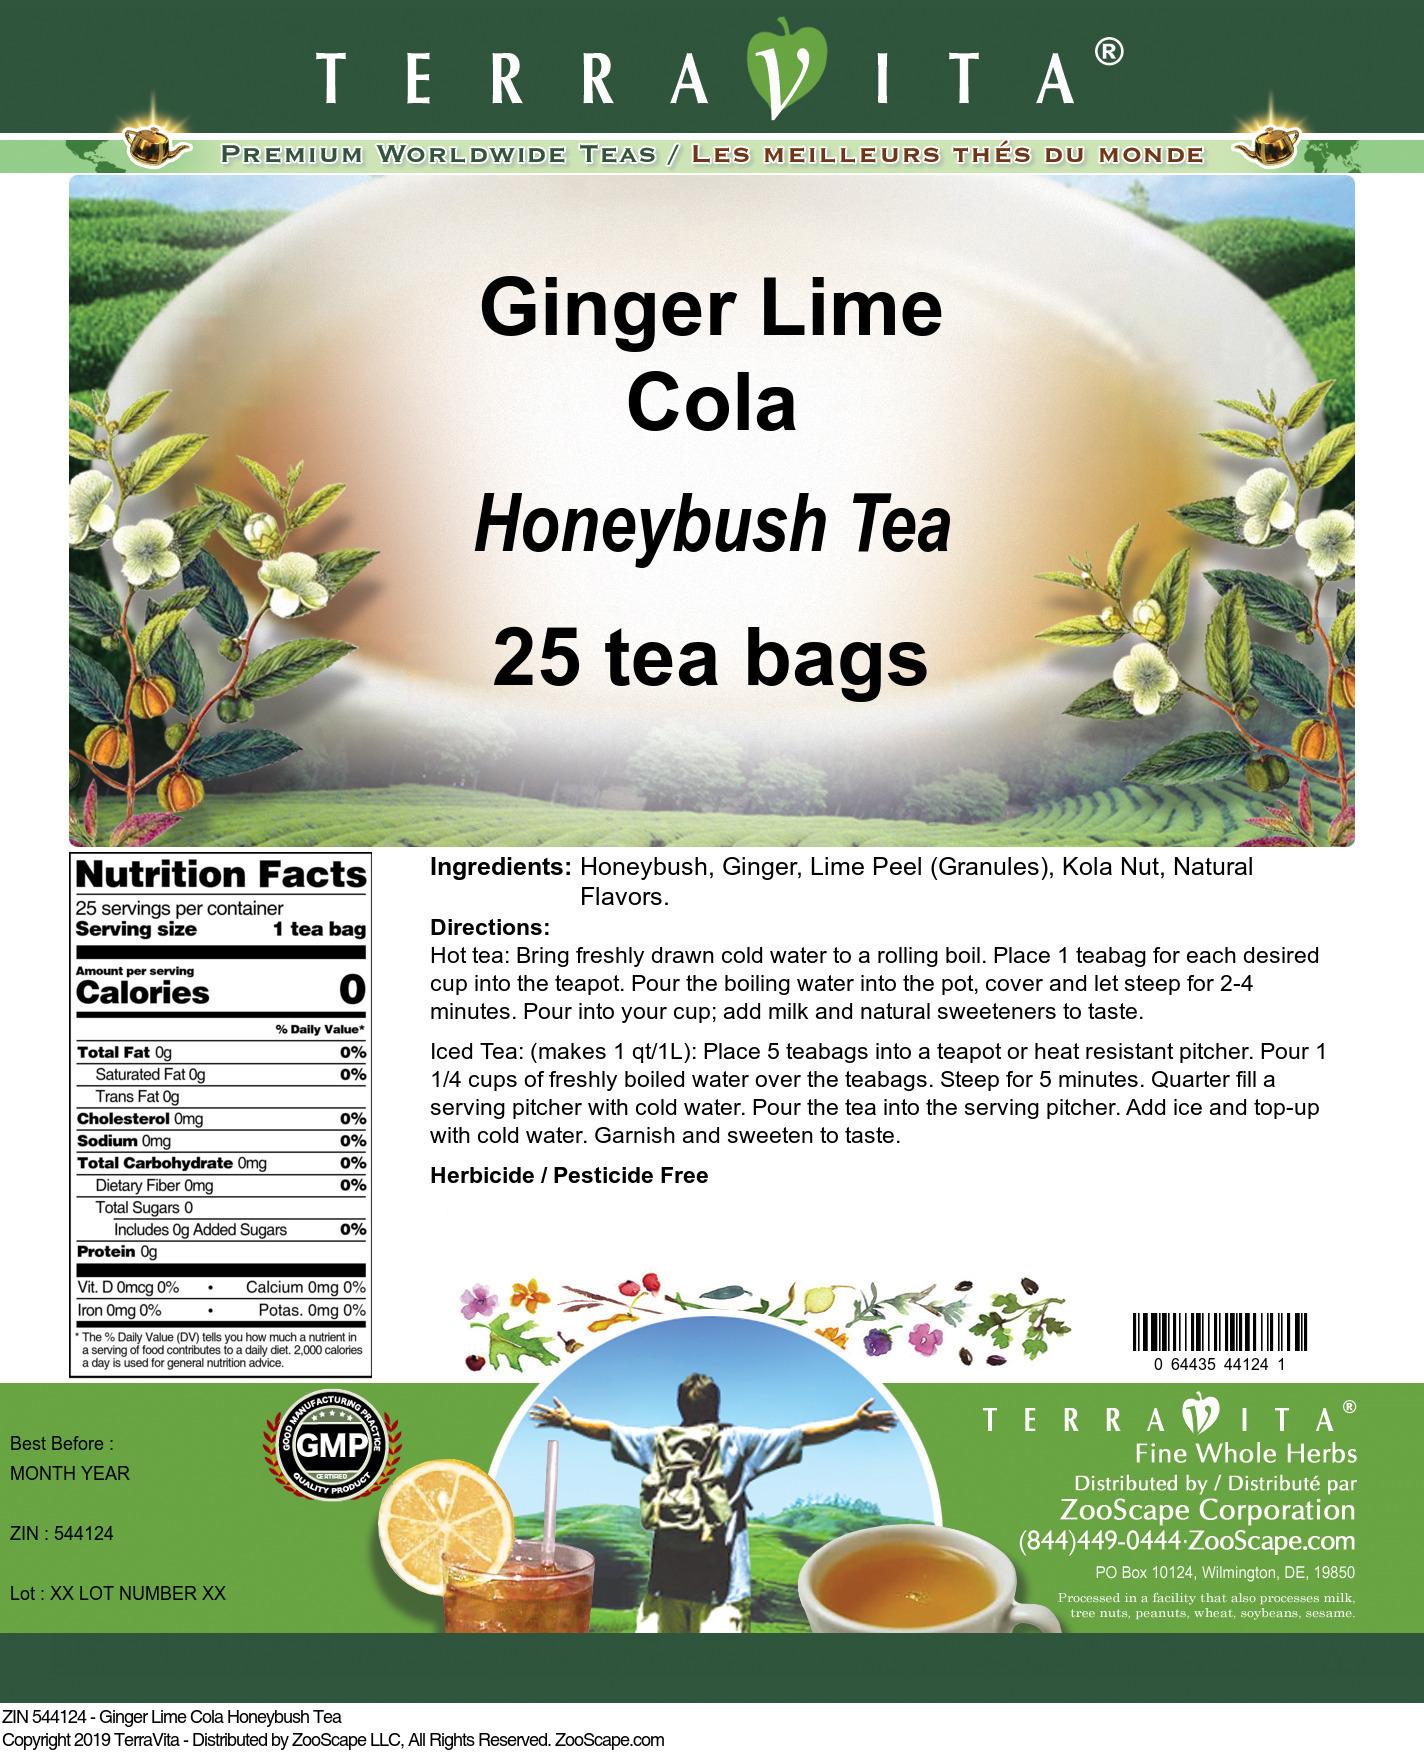 Ginger Lime Cola Honeybush Tea